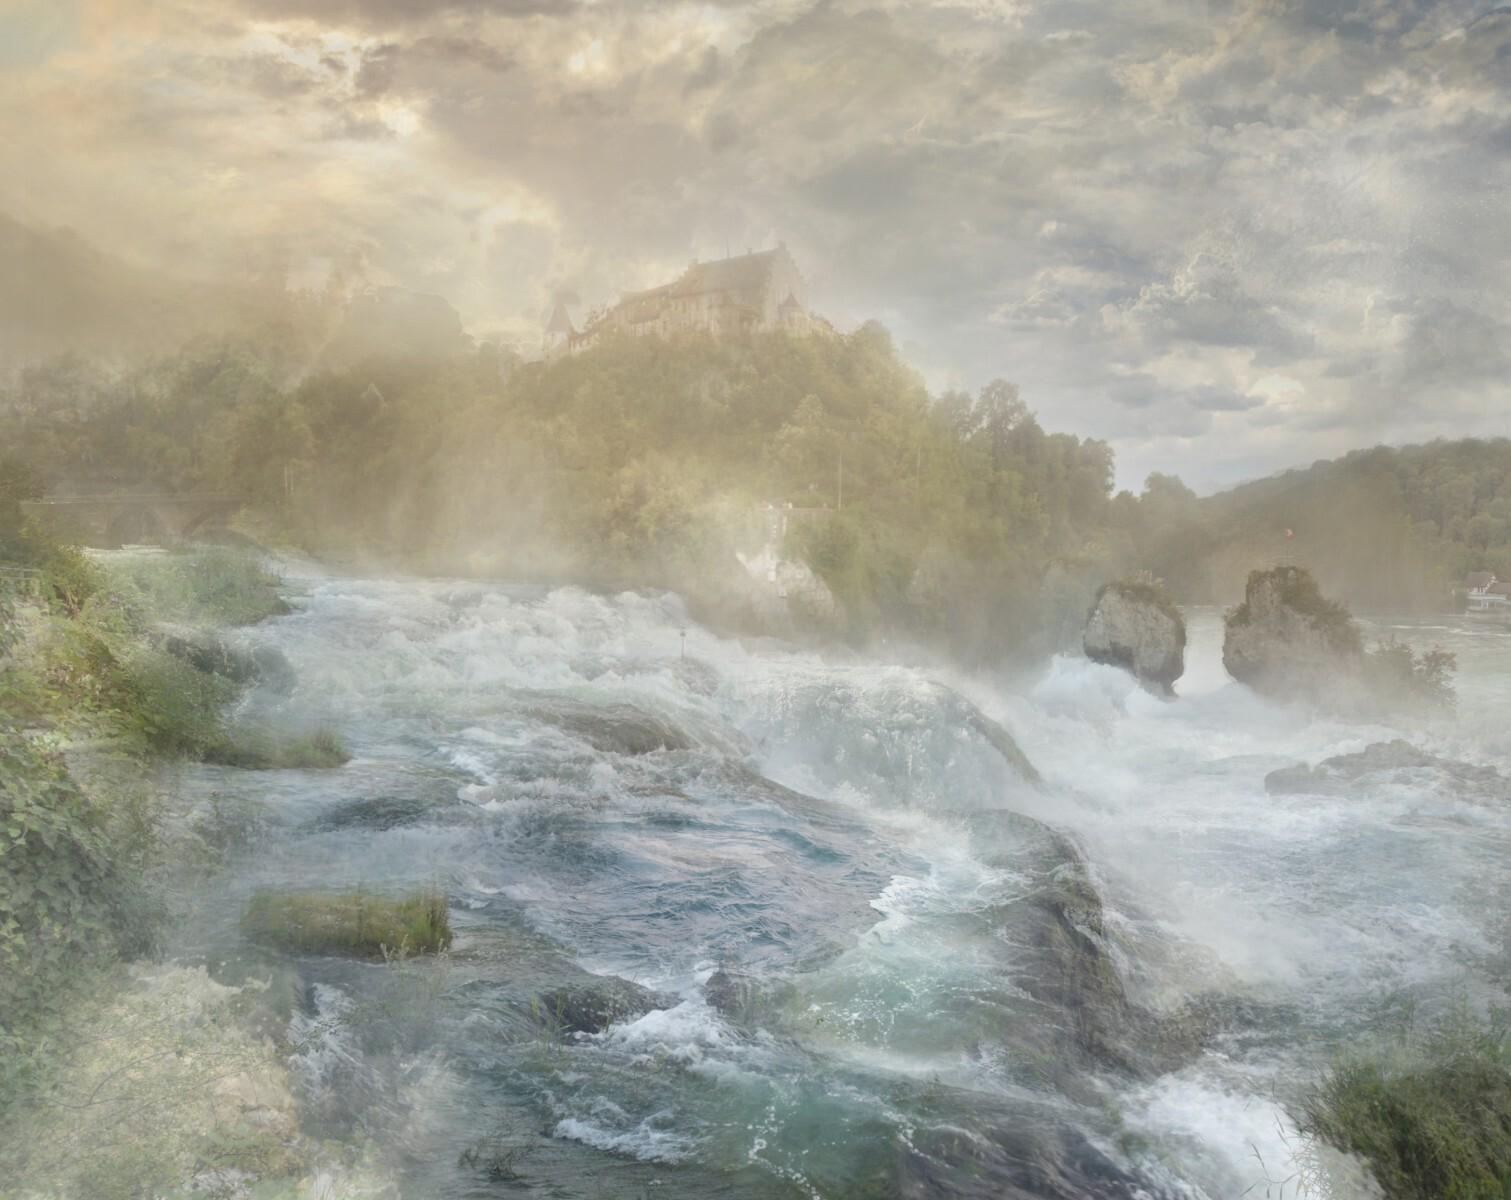 Hiroyuki Masuyama - J.M.W. Turner, The Falls of the Rhine at Schaffhausen, 1841